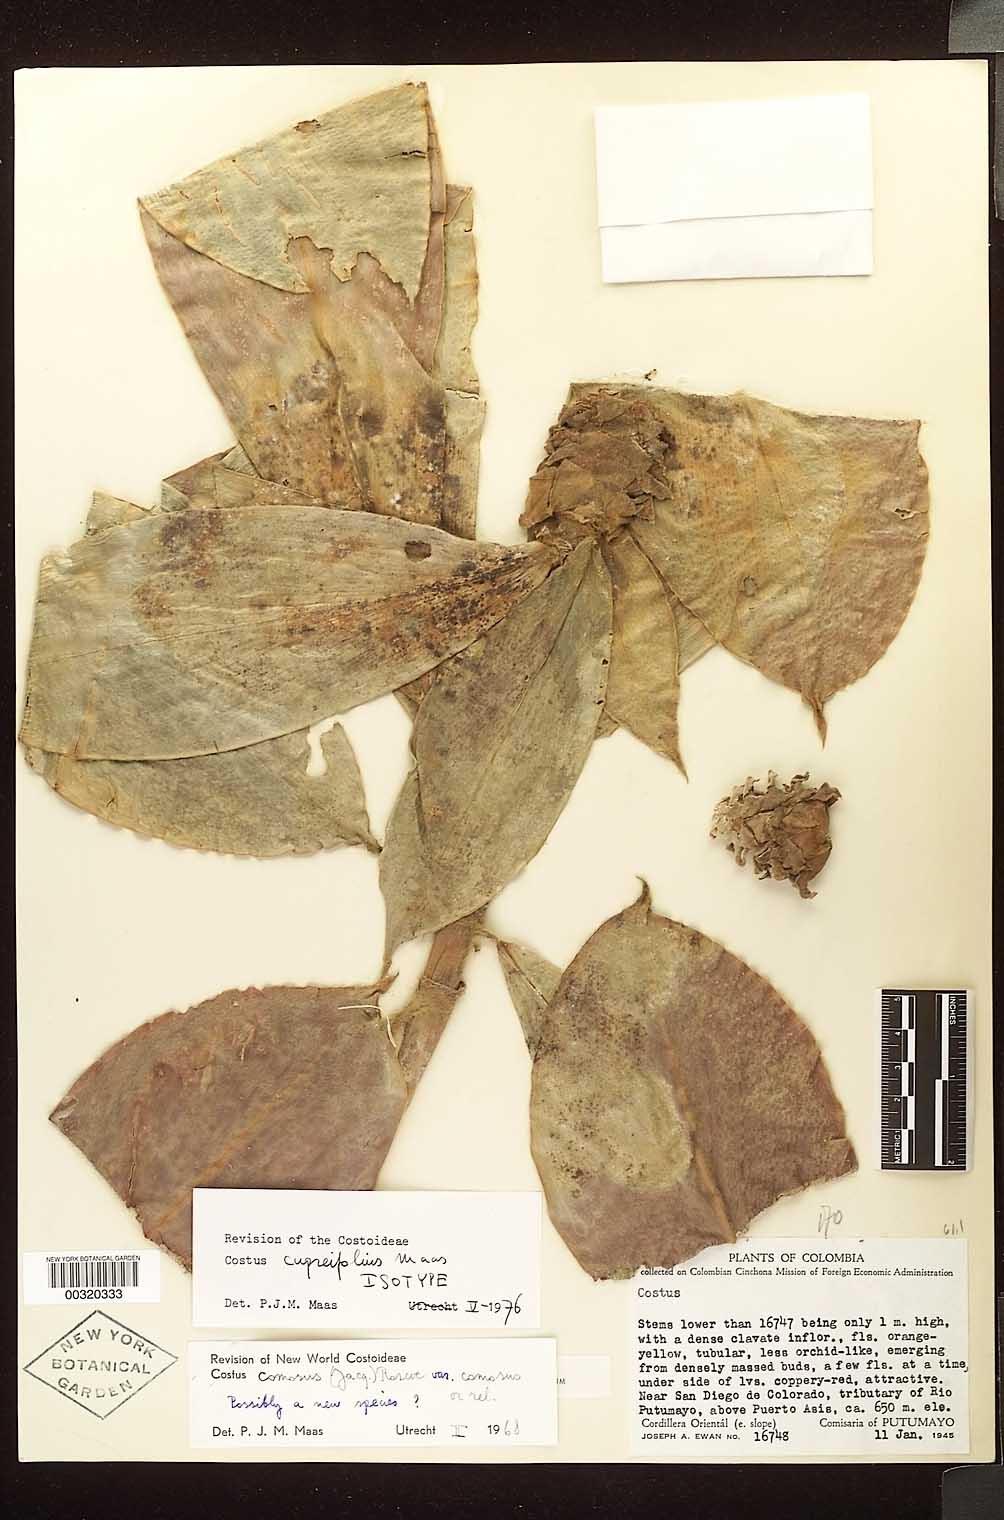 Photo# 17699 - Costus cupreiflius isotype at NYBG